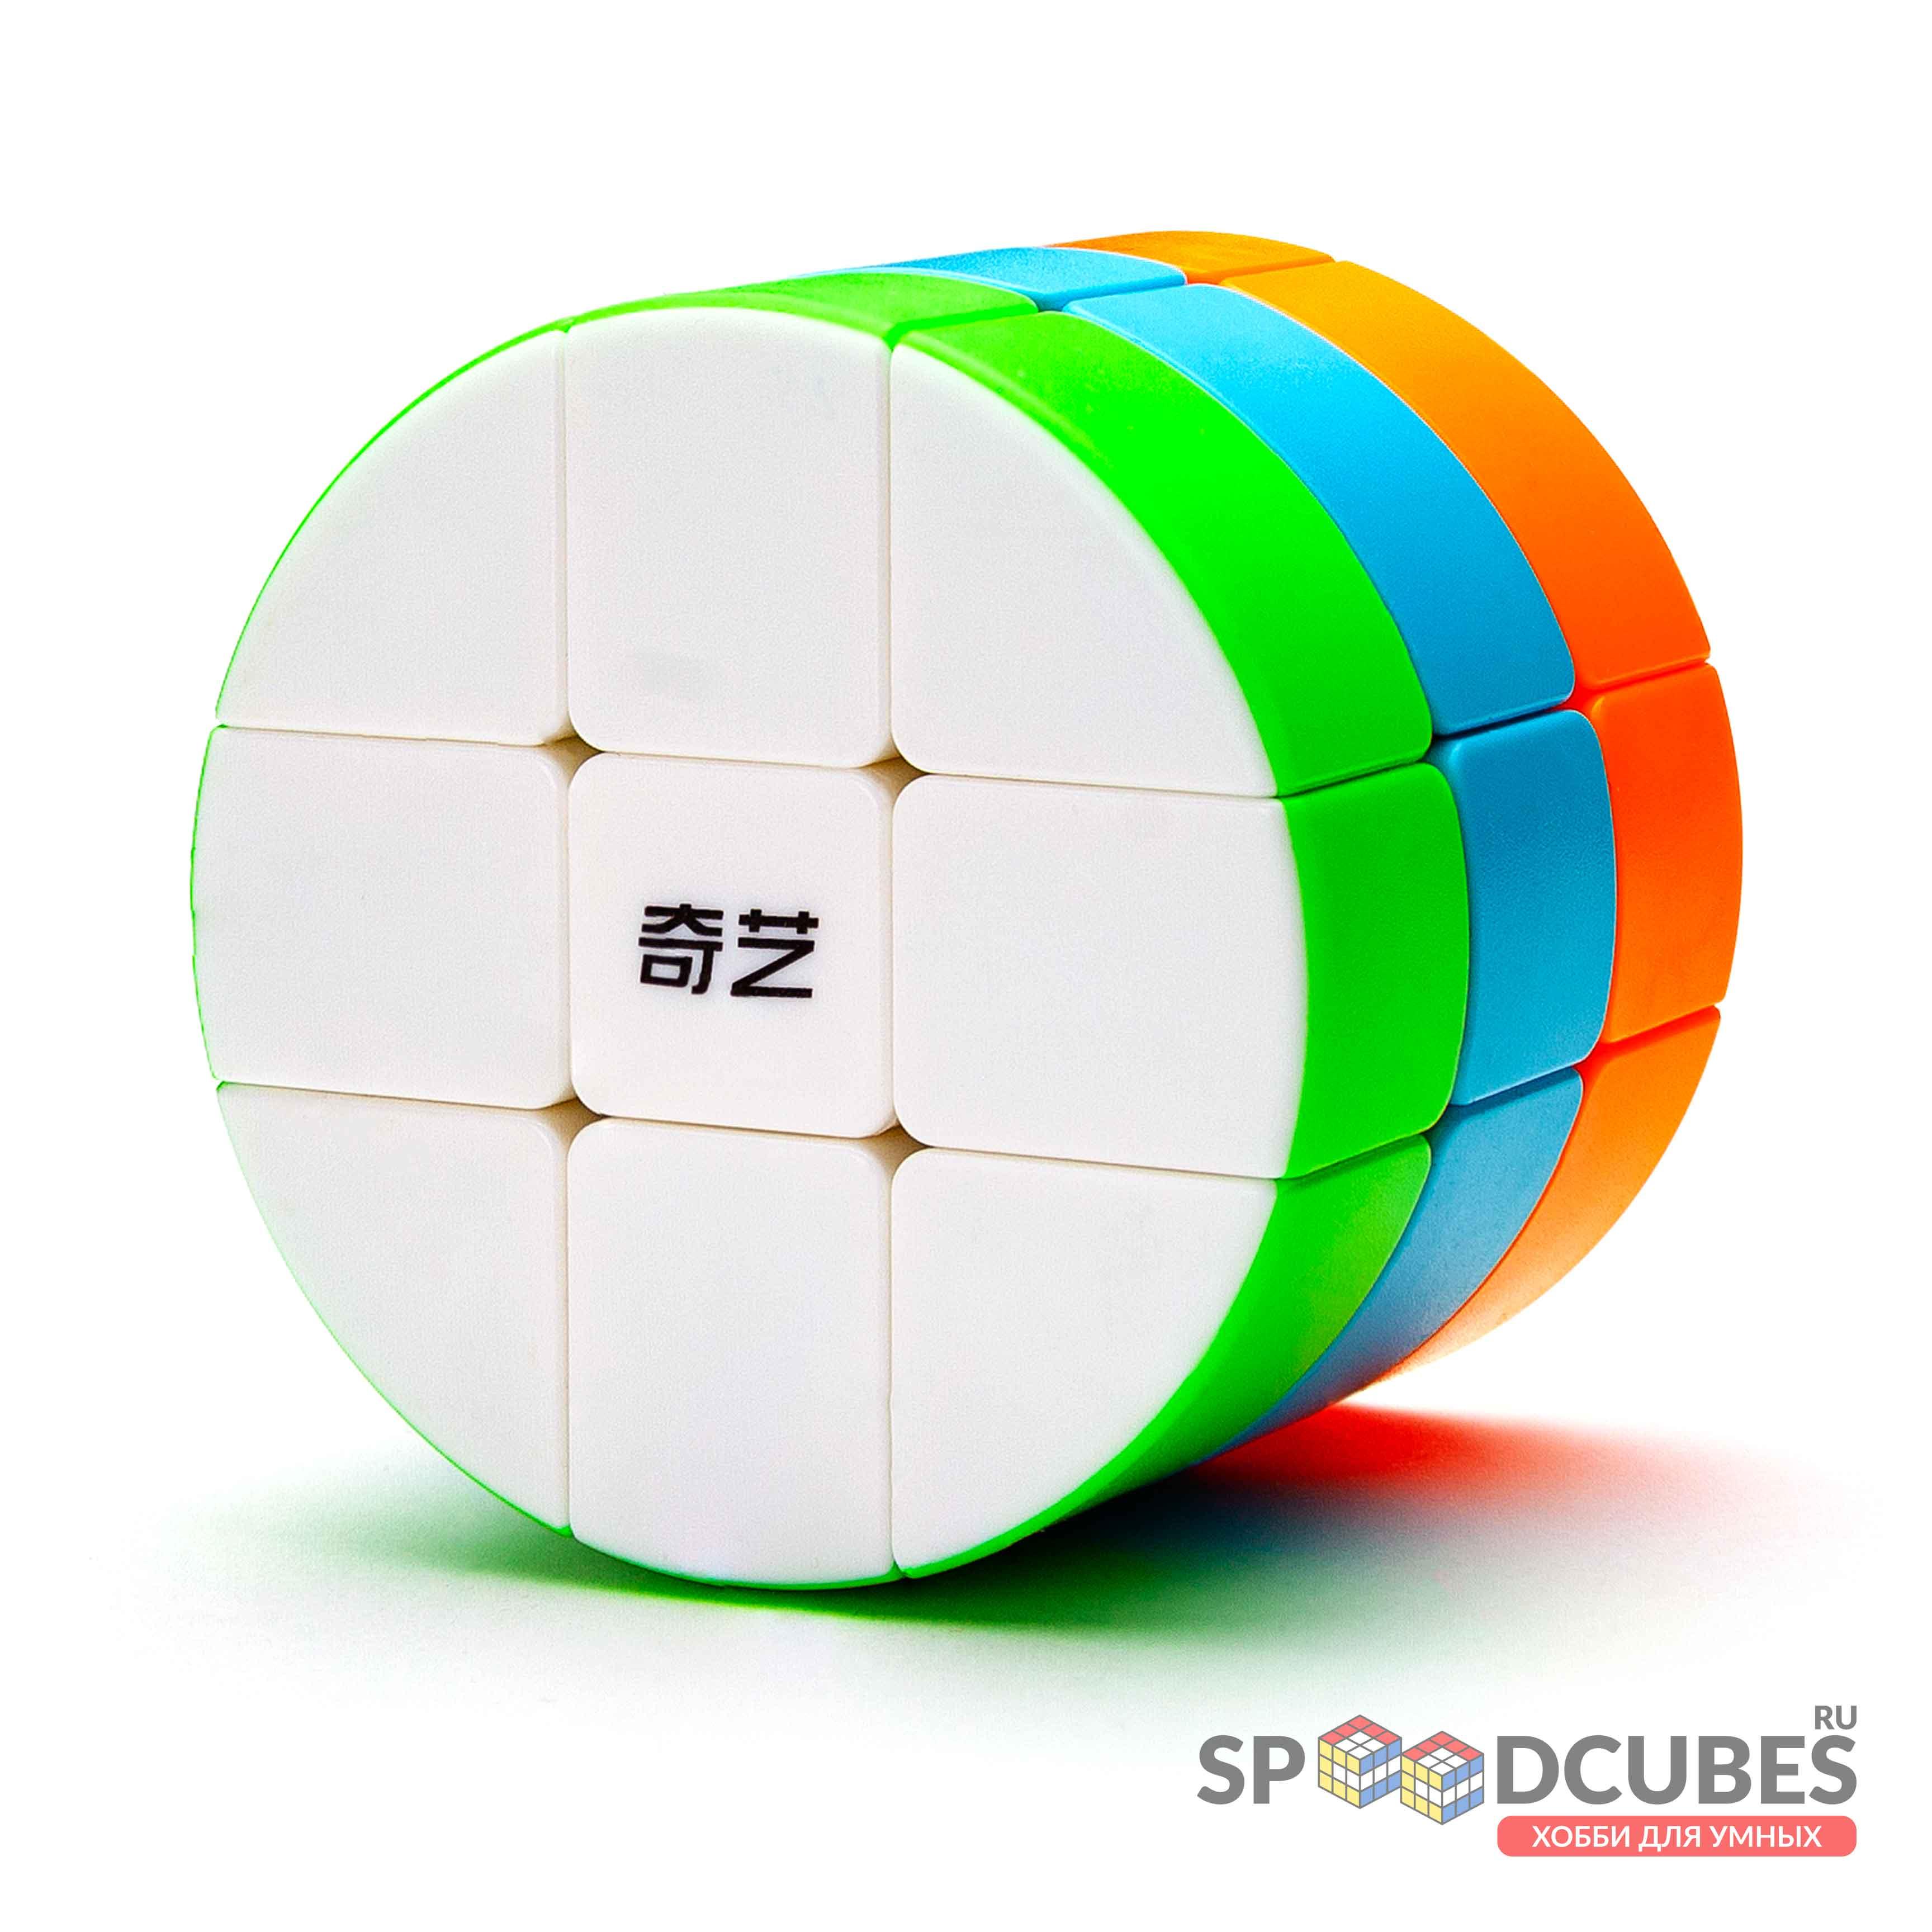 QiYi (MoFangGe) 3x3 Cylinder Cube